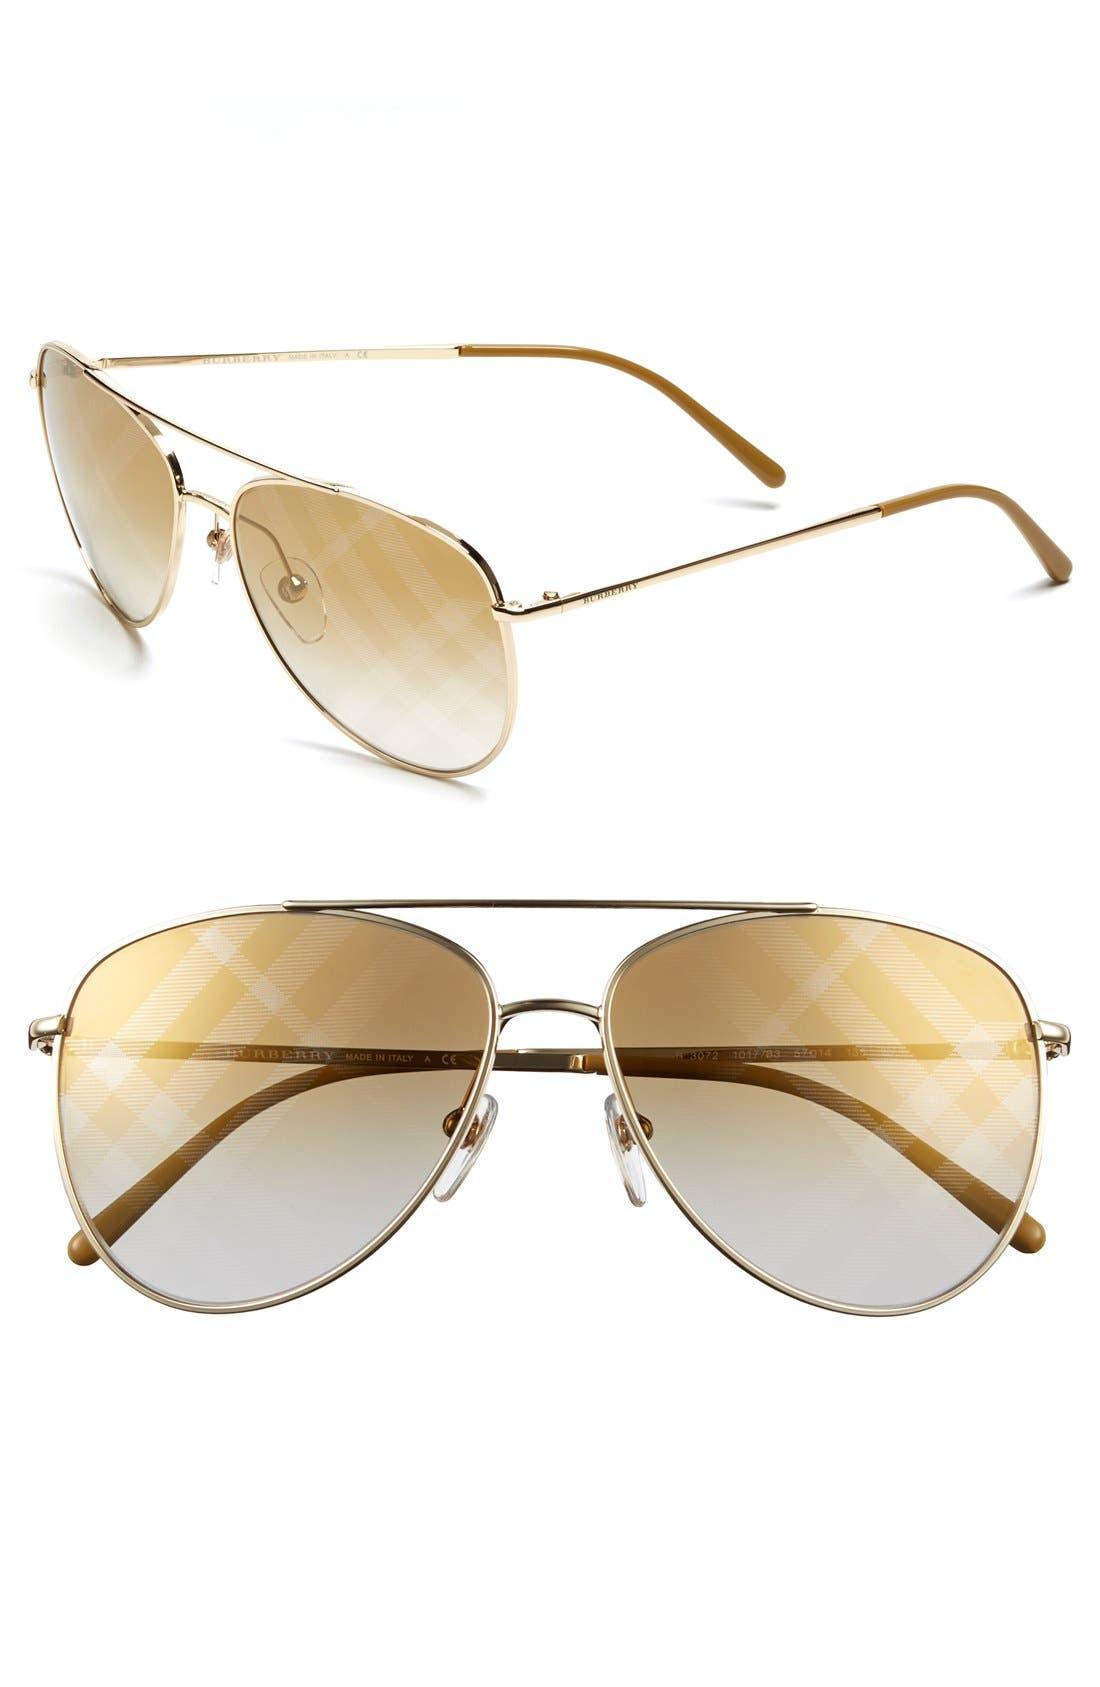 Main Image - Burberry 57mm Aviator Sunglasses